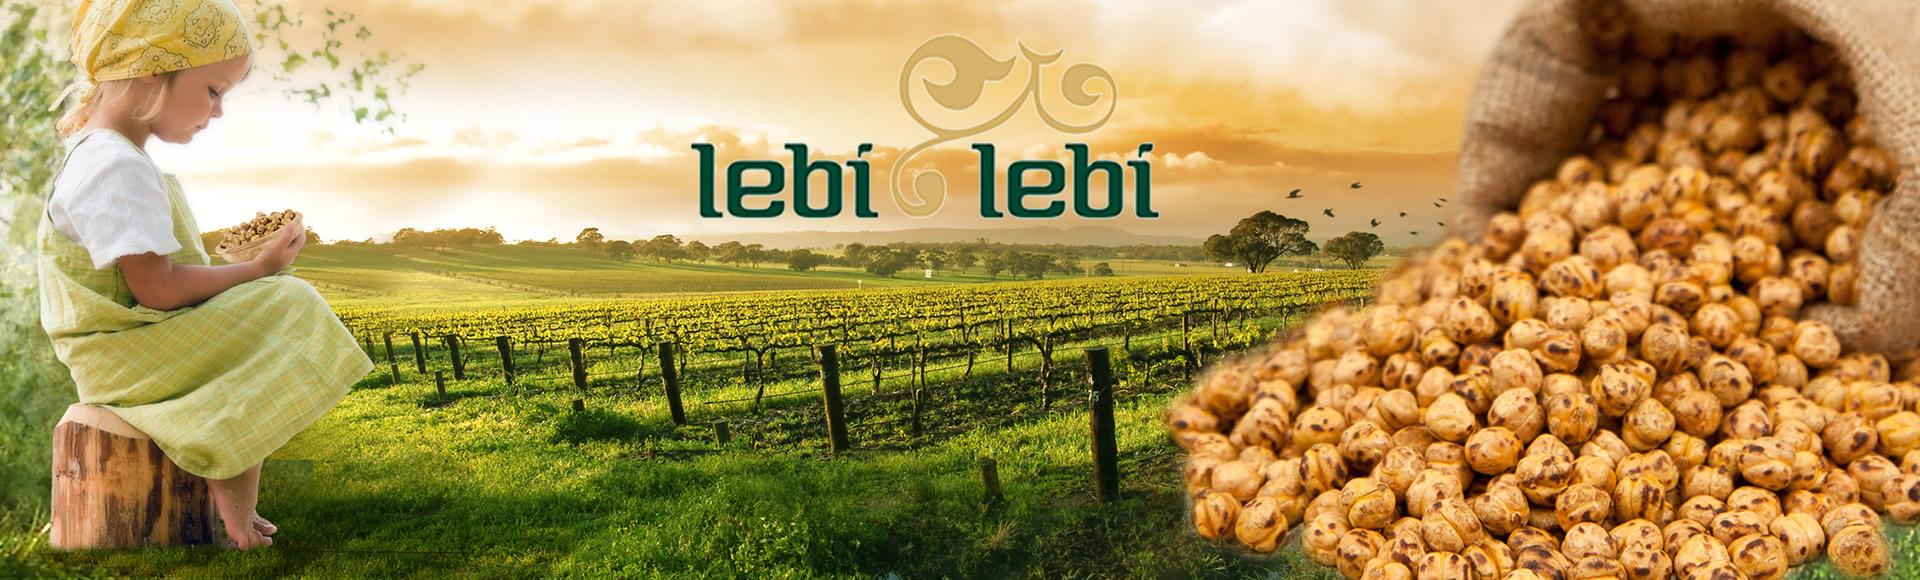 LebiLebi